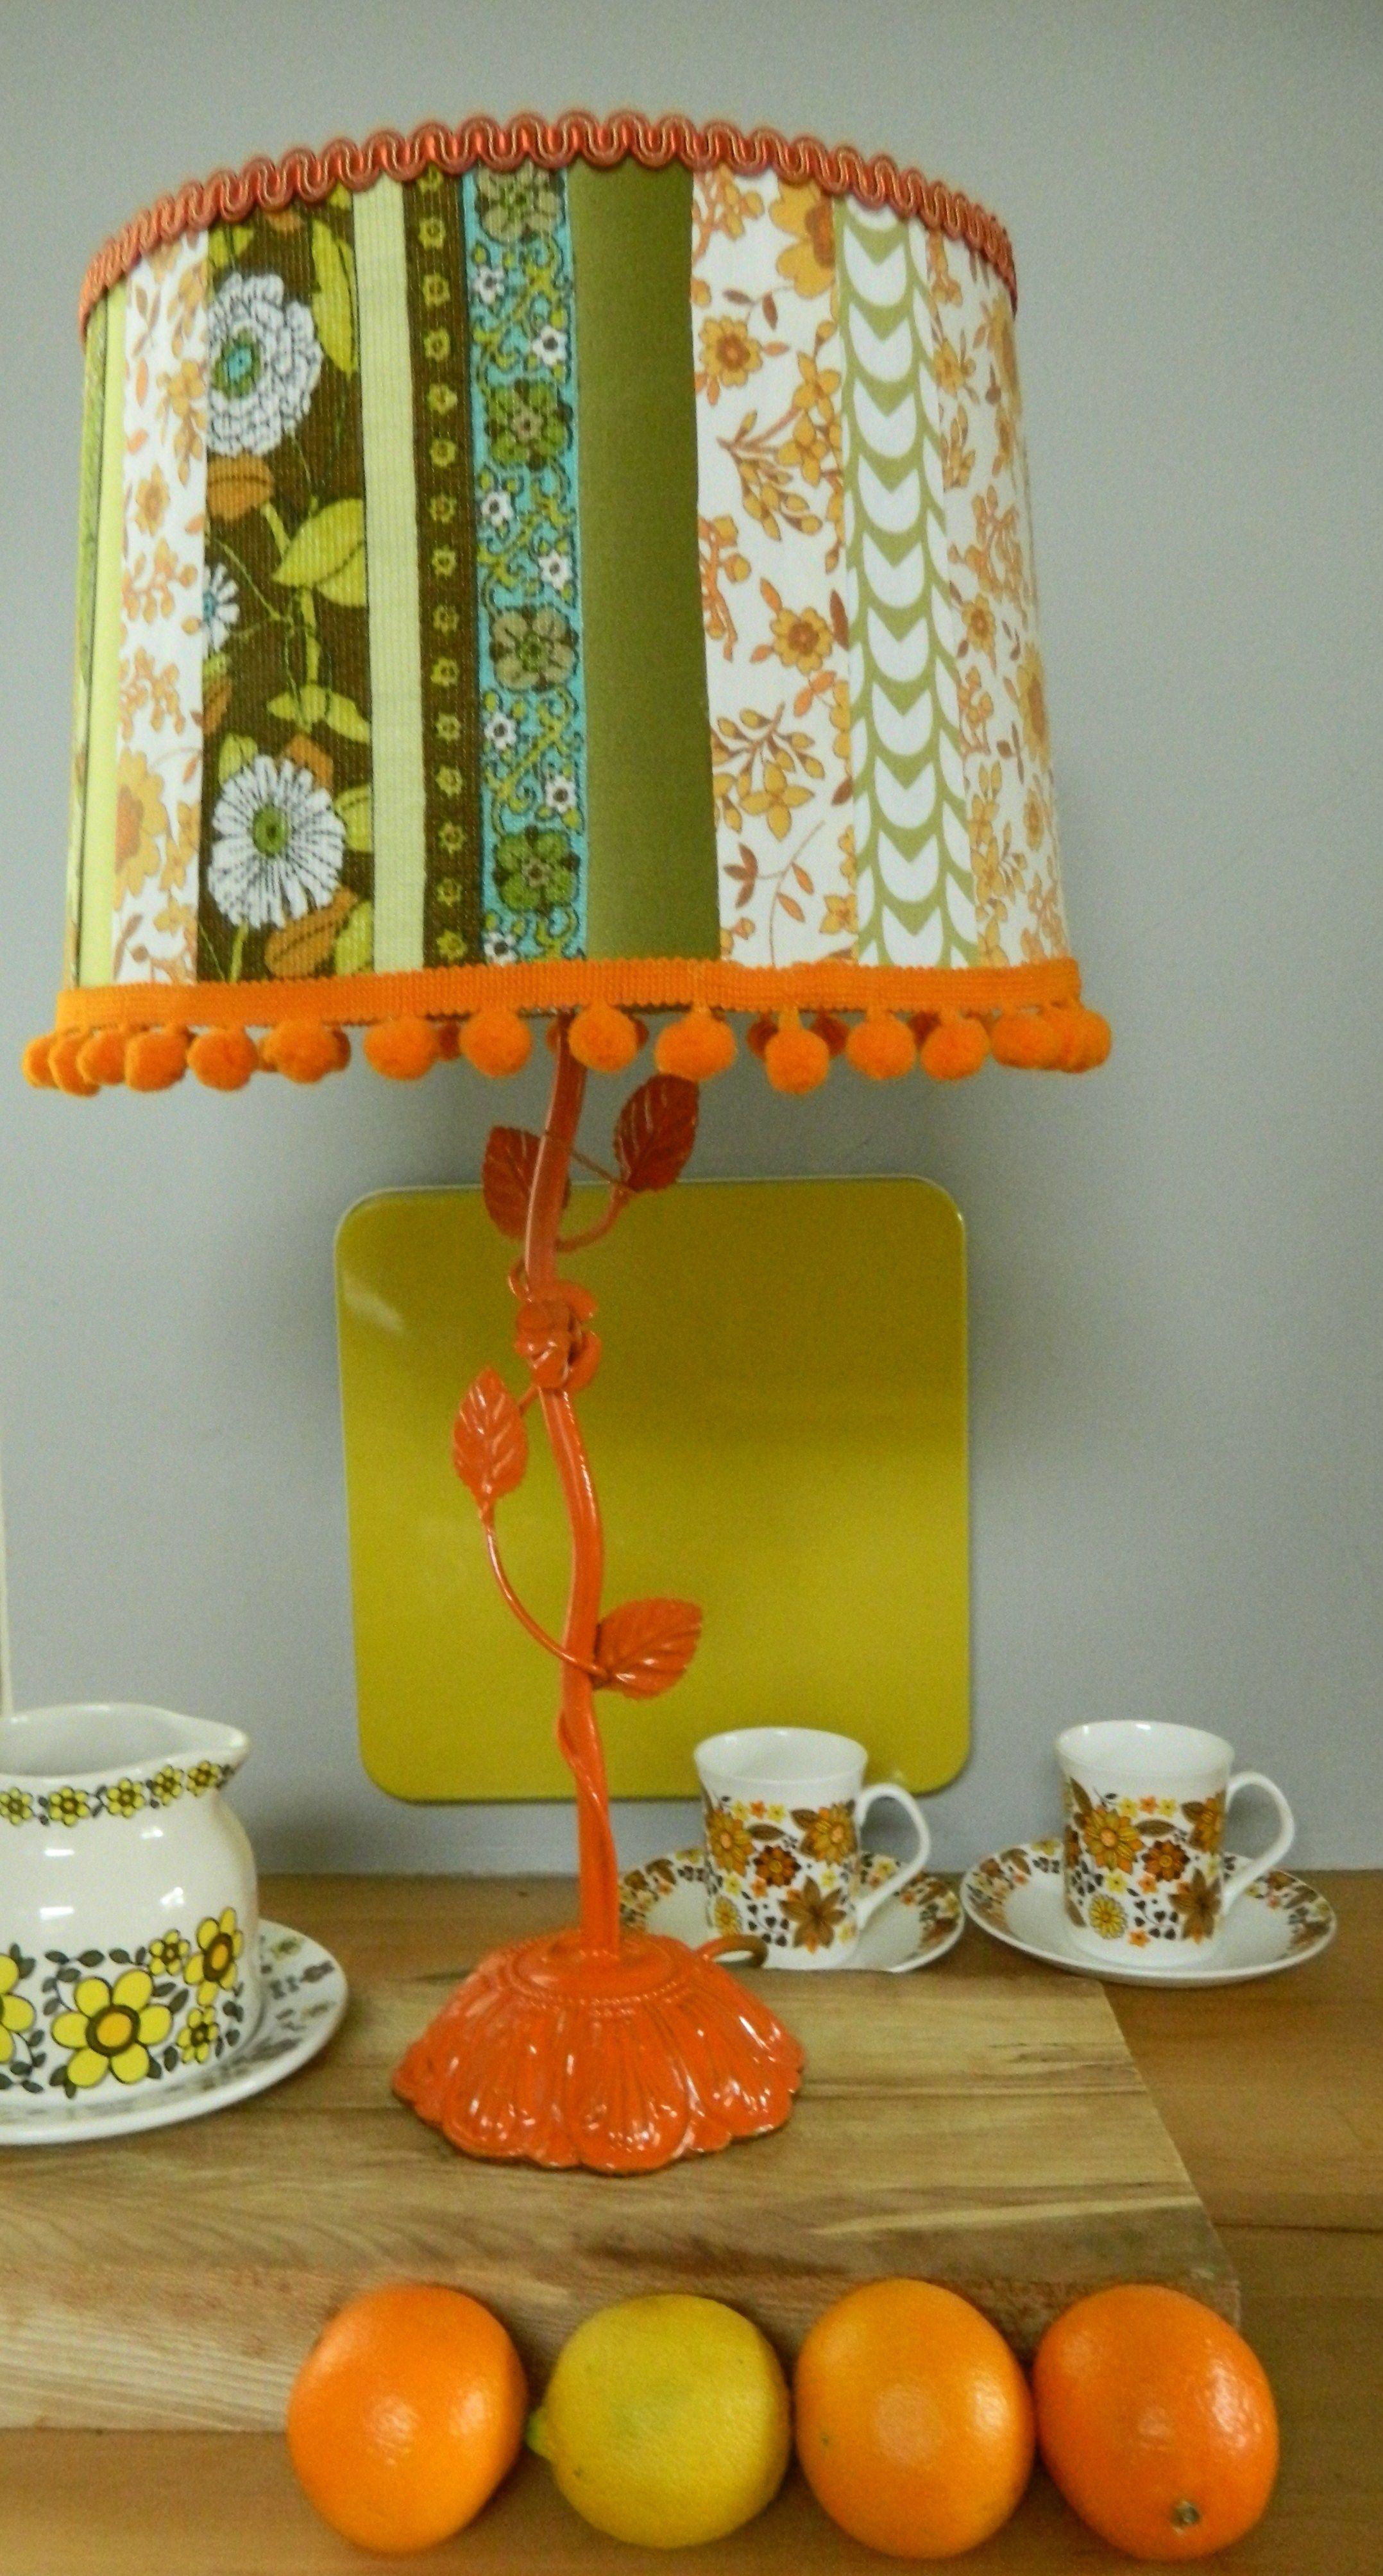 Patchwork Vintage Fabric Lamp By Clarabella Christie Www Clarabellachr